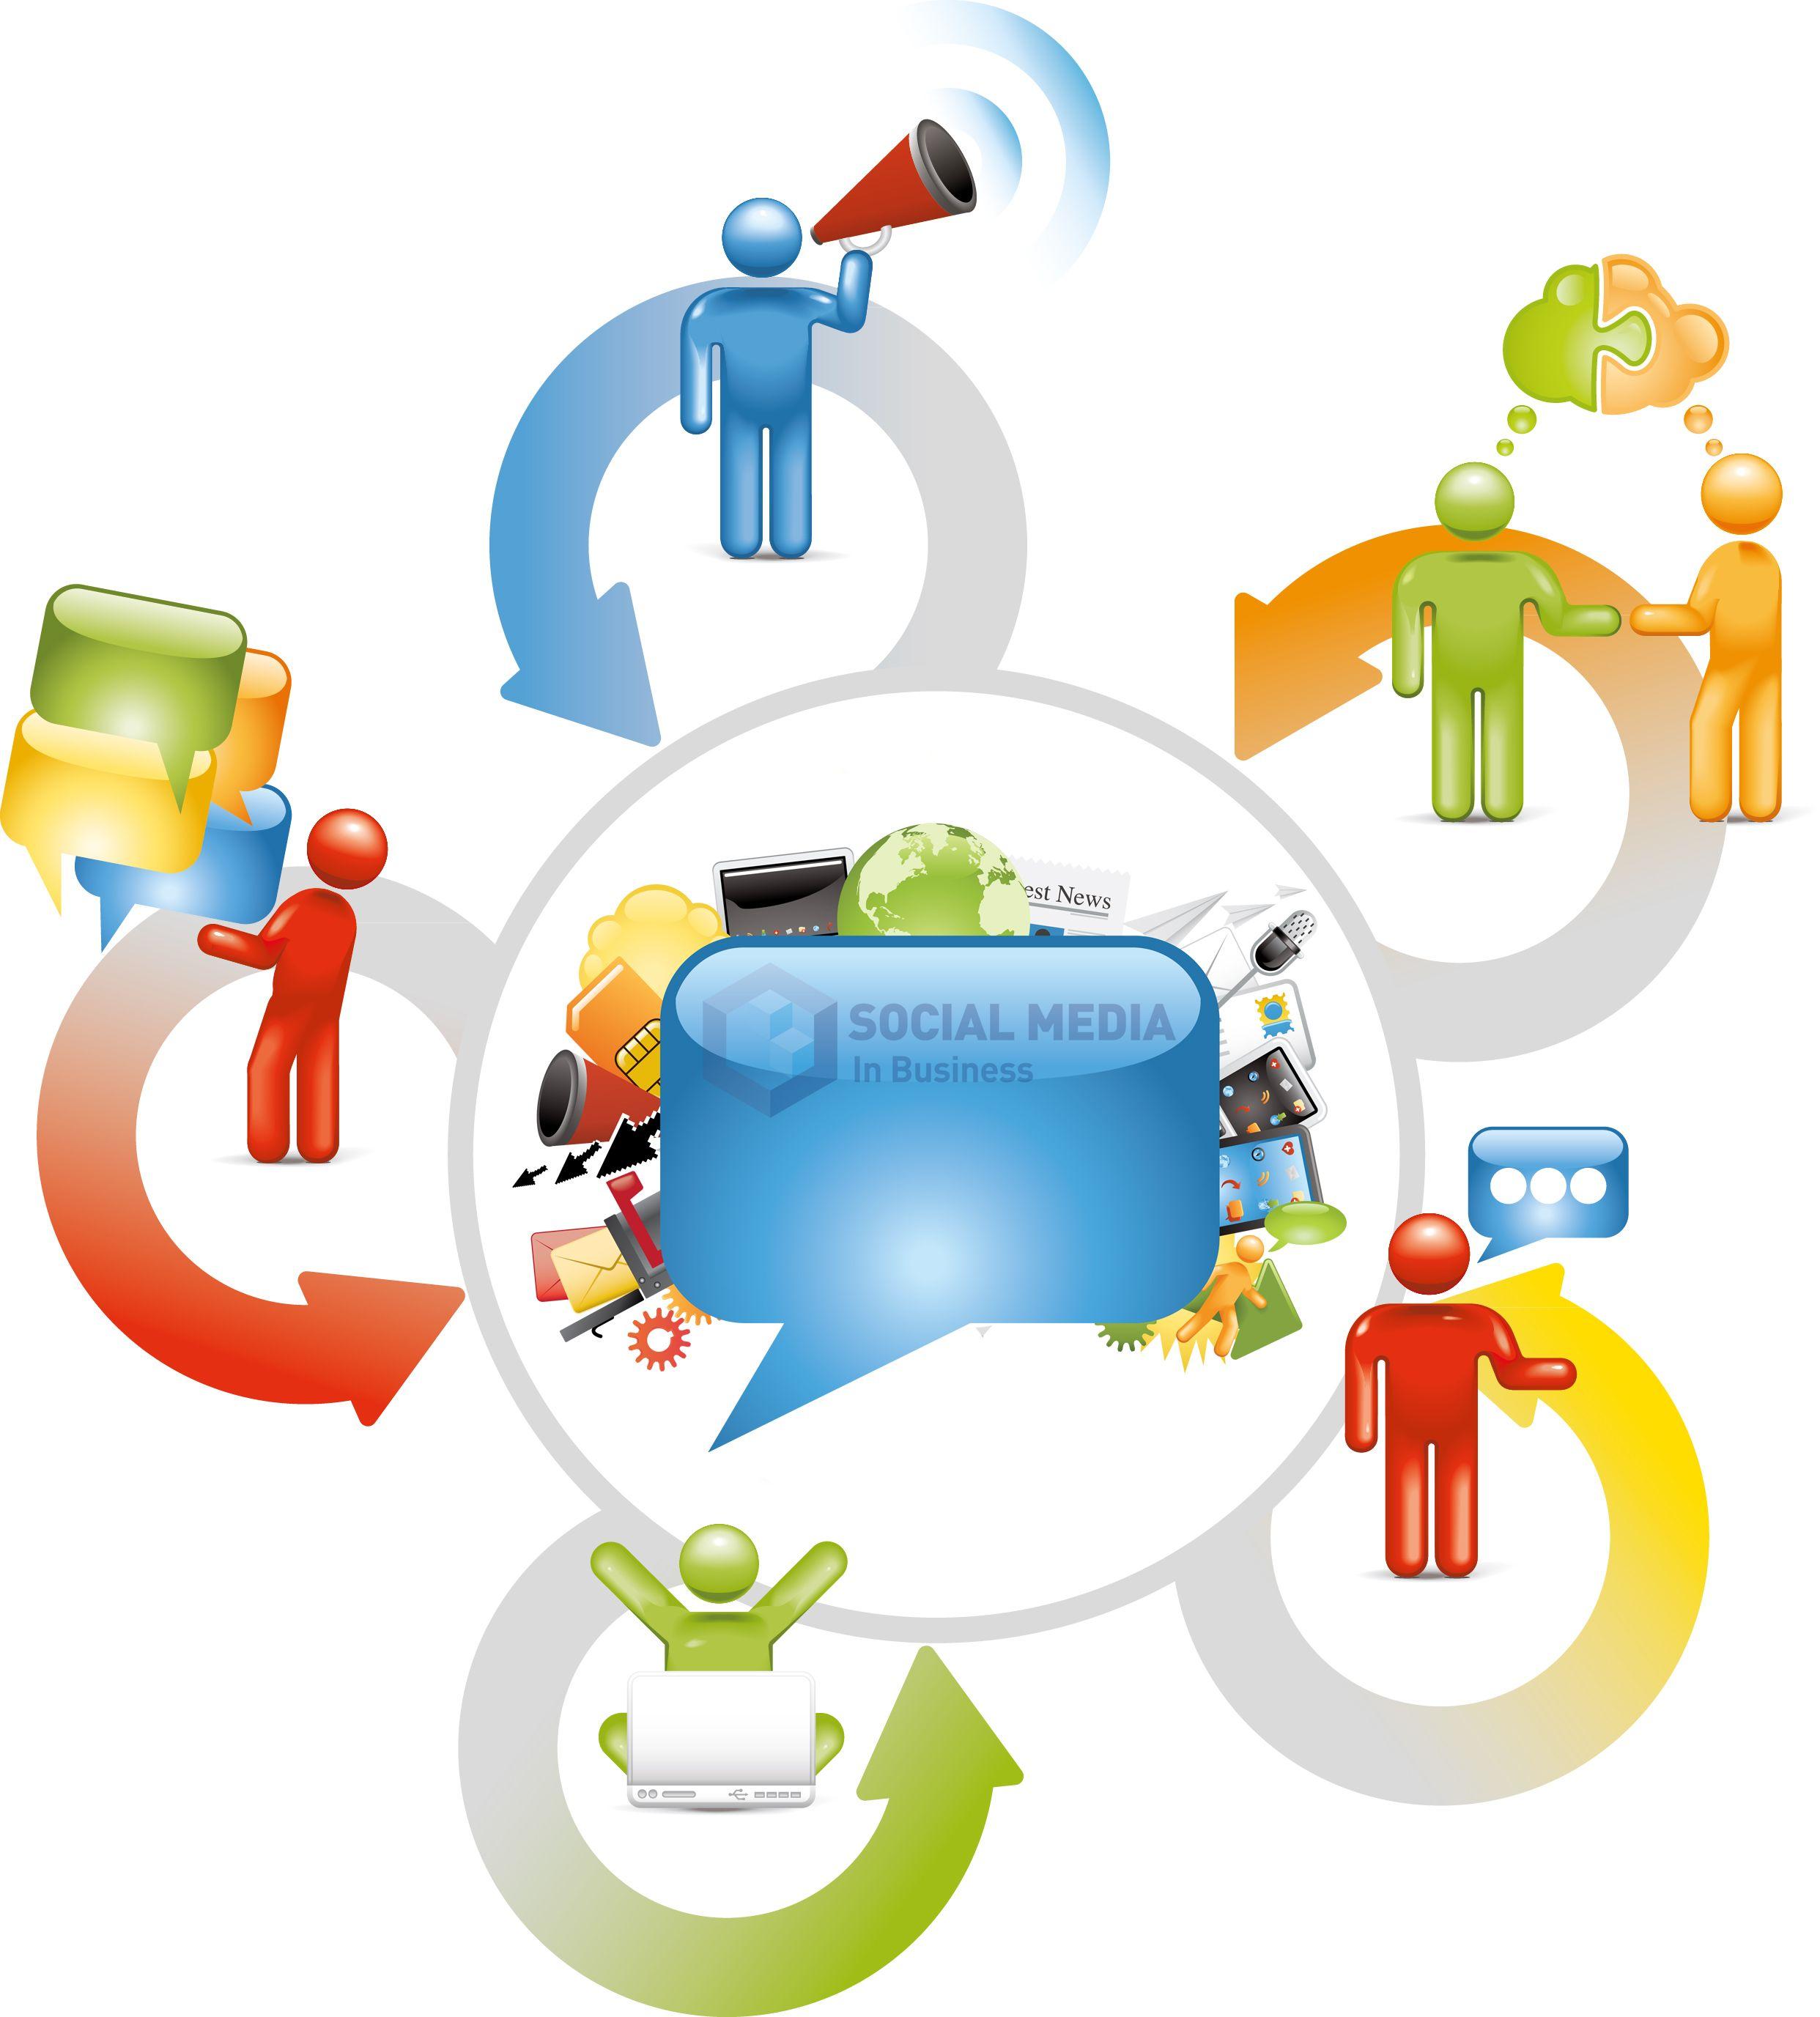 social media in business internal communication strategies lets